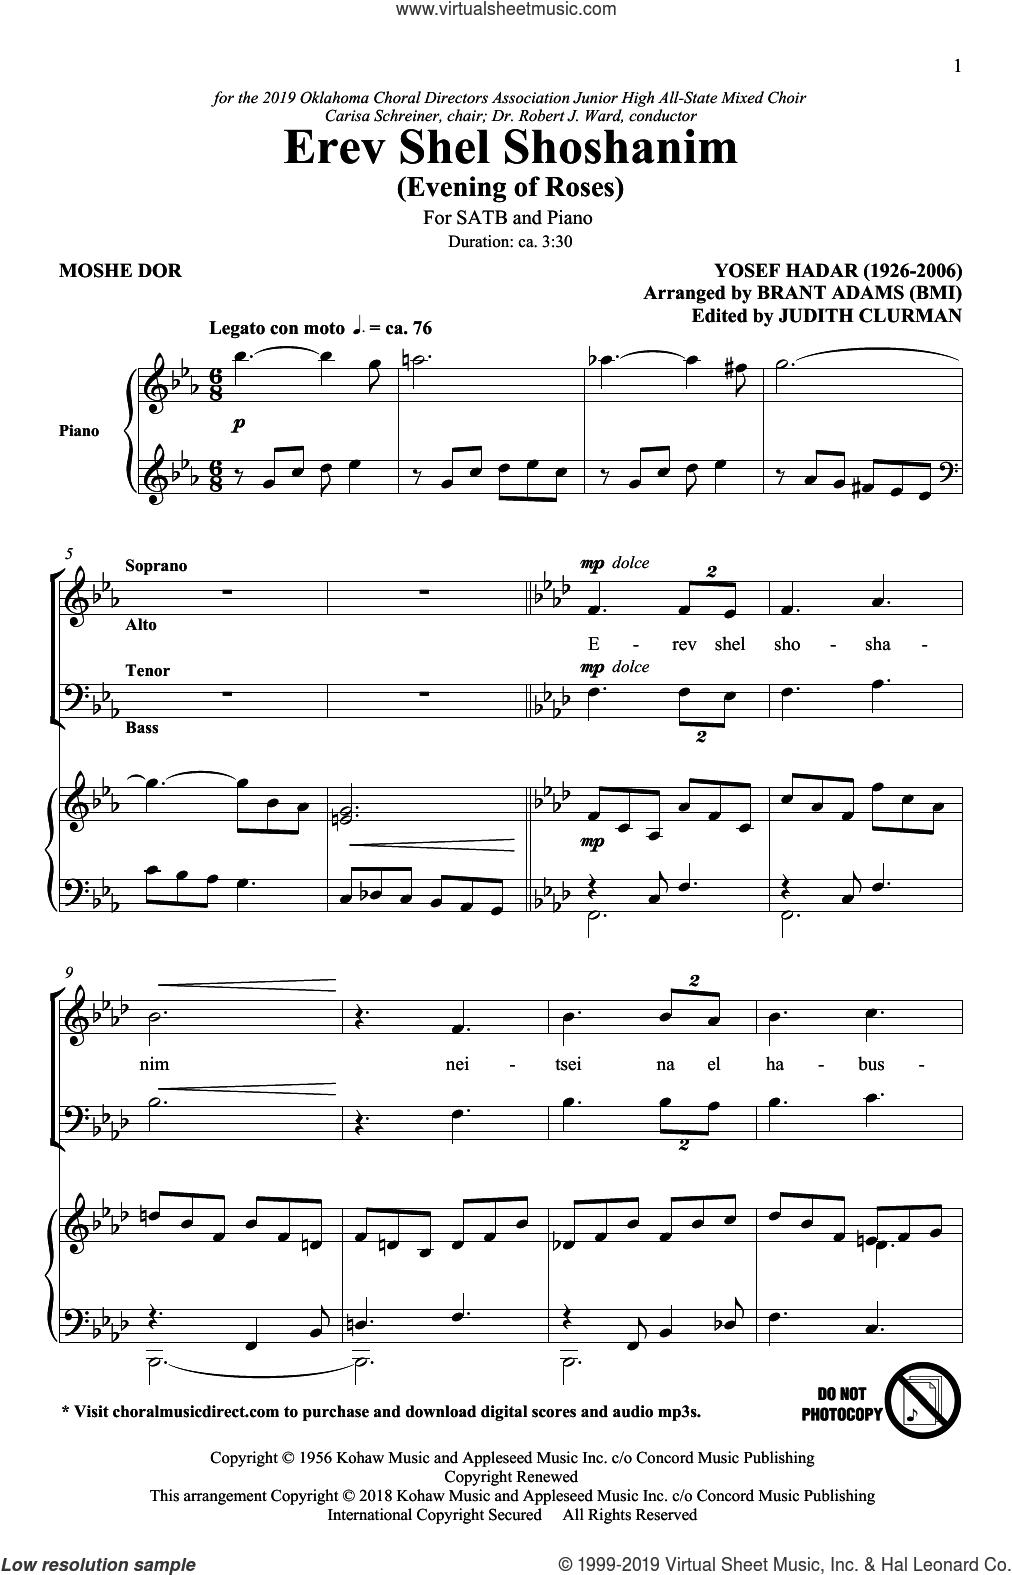 Erev Shel Shoshanim (arr. Brant Adams) sheet music for choir (SATB: soprano, alto, tenor, bass) by Yosef Hadar, Brant Adams, Moshe Dor and Moshe Dor & Yosef Hadar, intermediate skill level